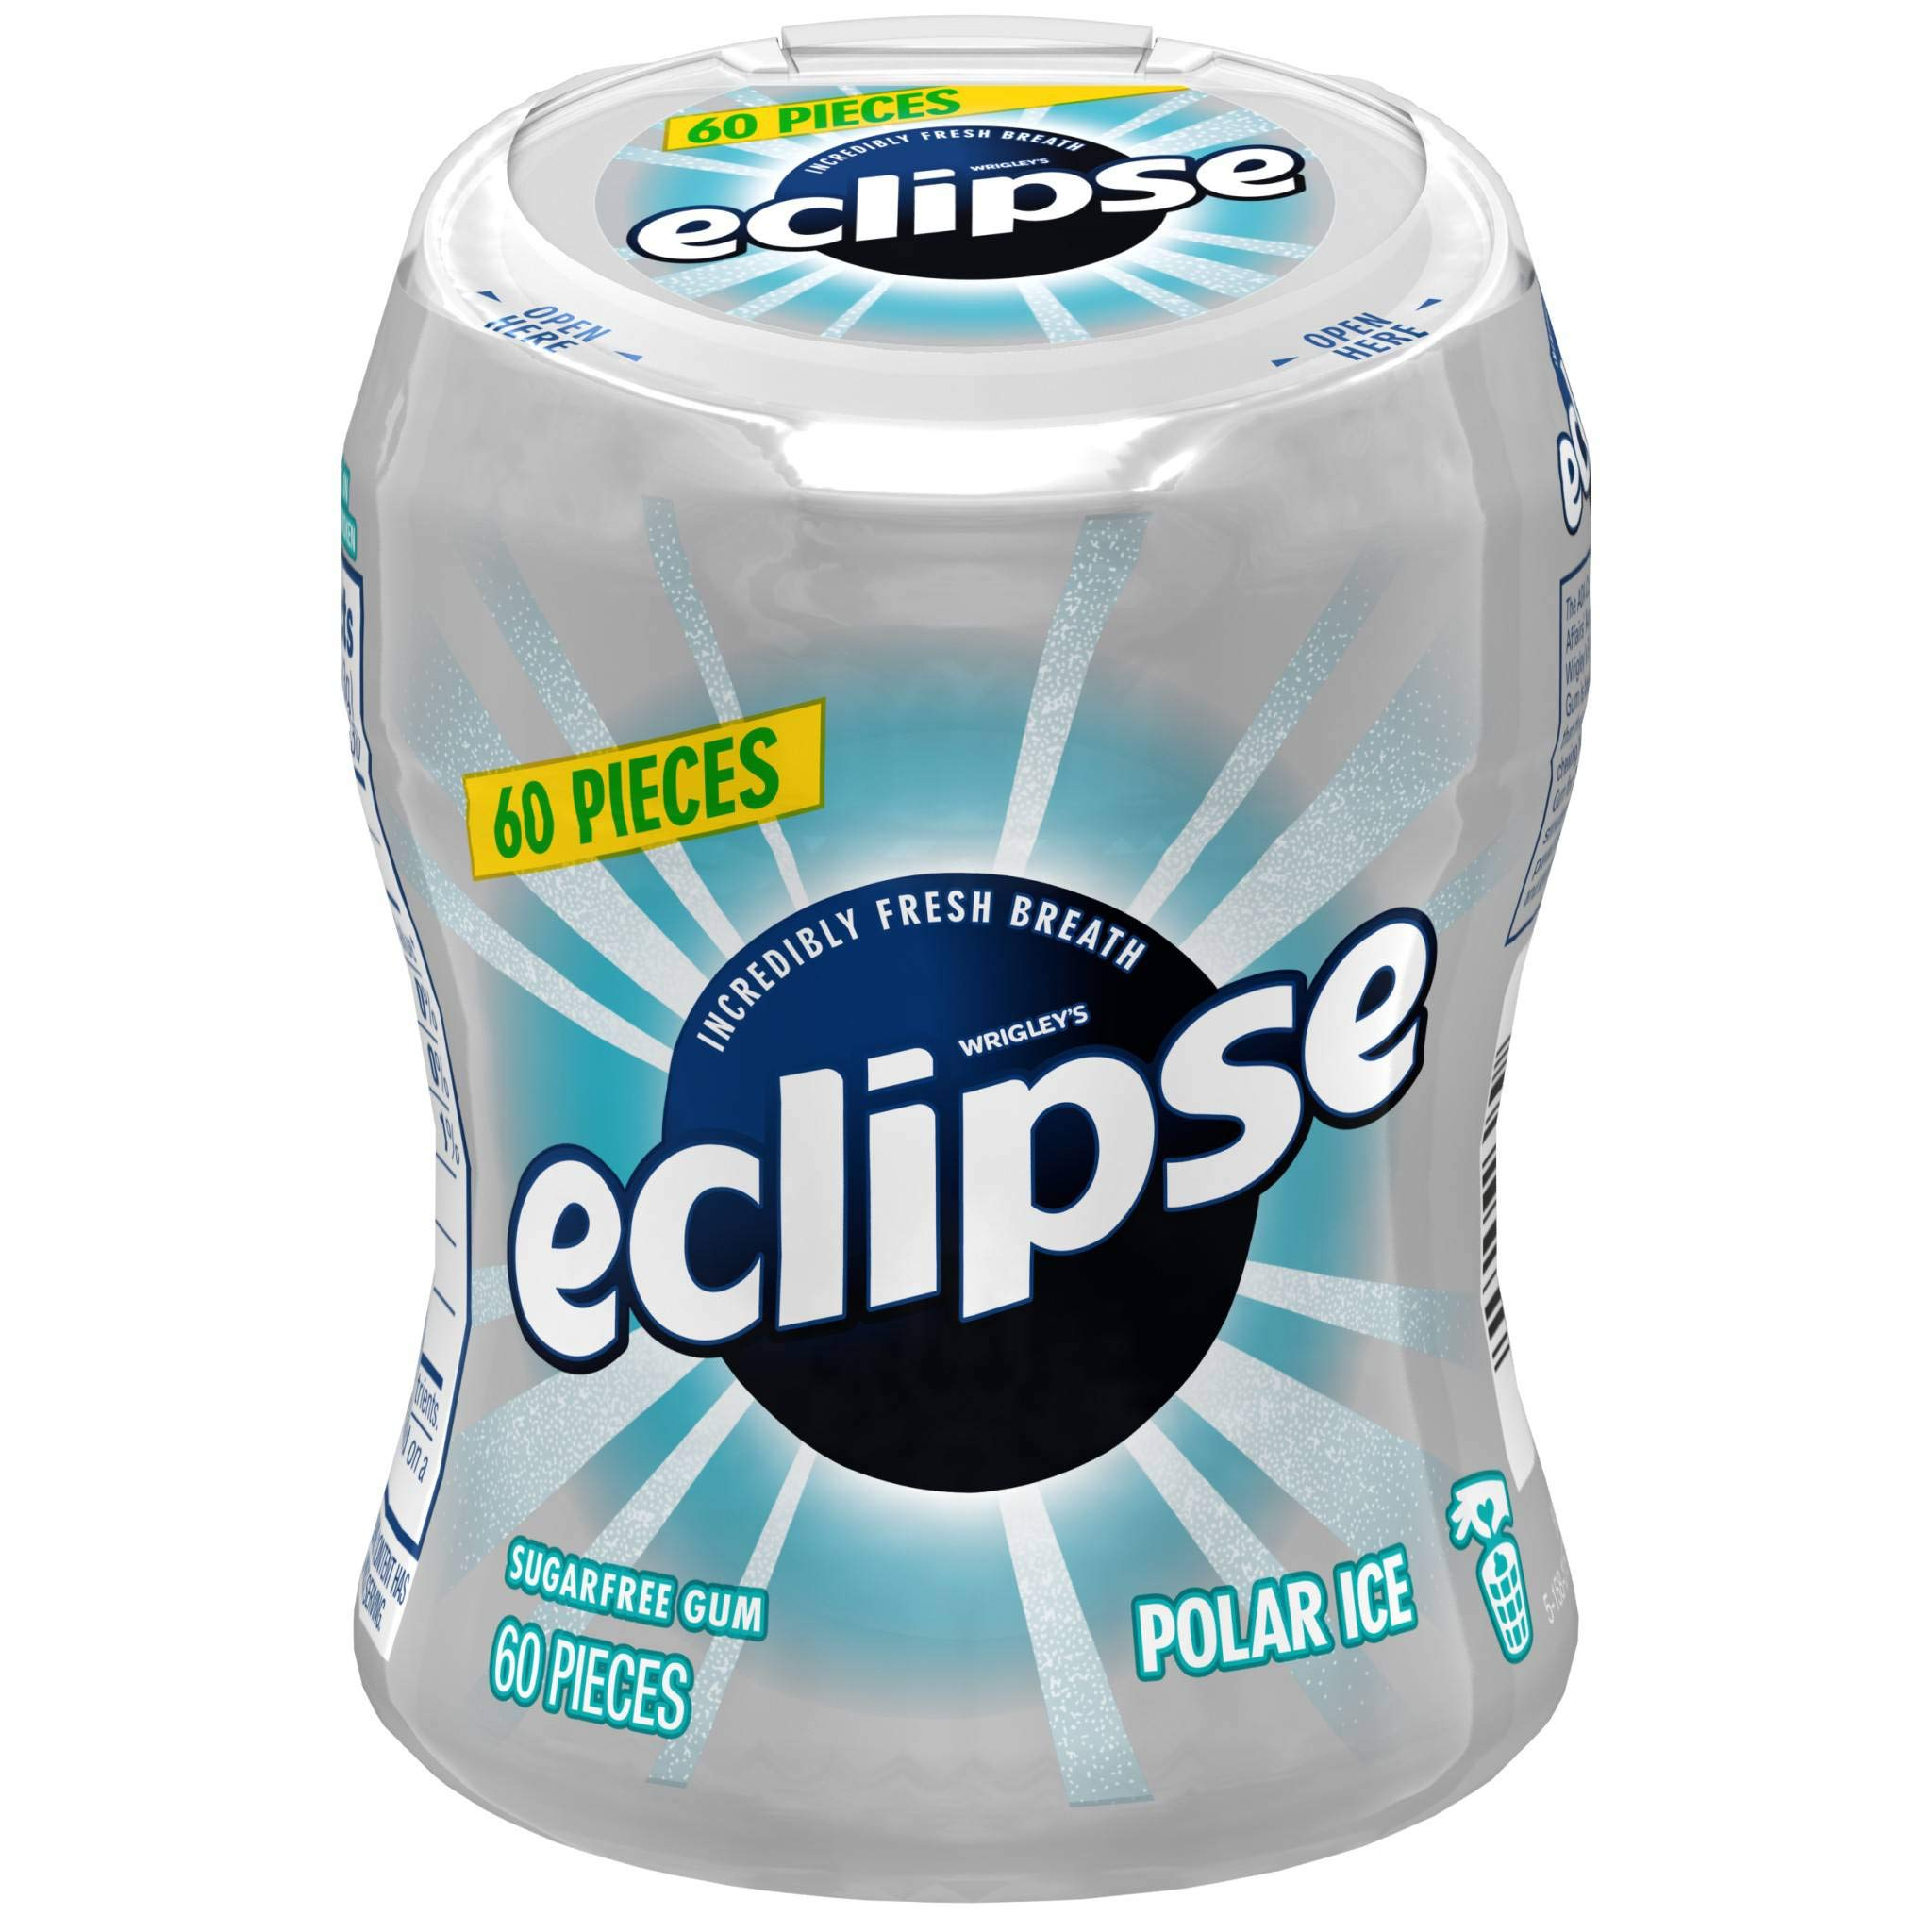 Eclipse Polar Ice Sugarfree Gum - 10 count per pack -- 3 packs per case.